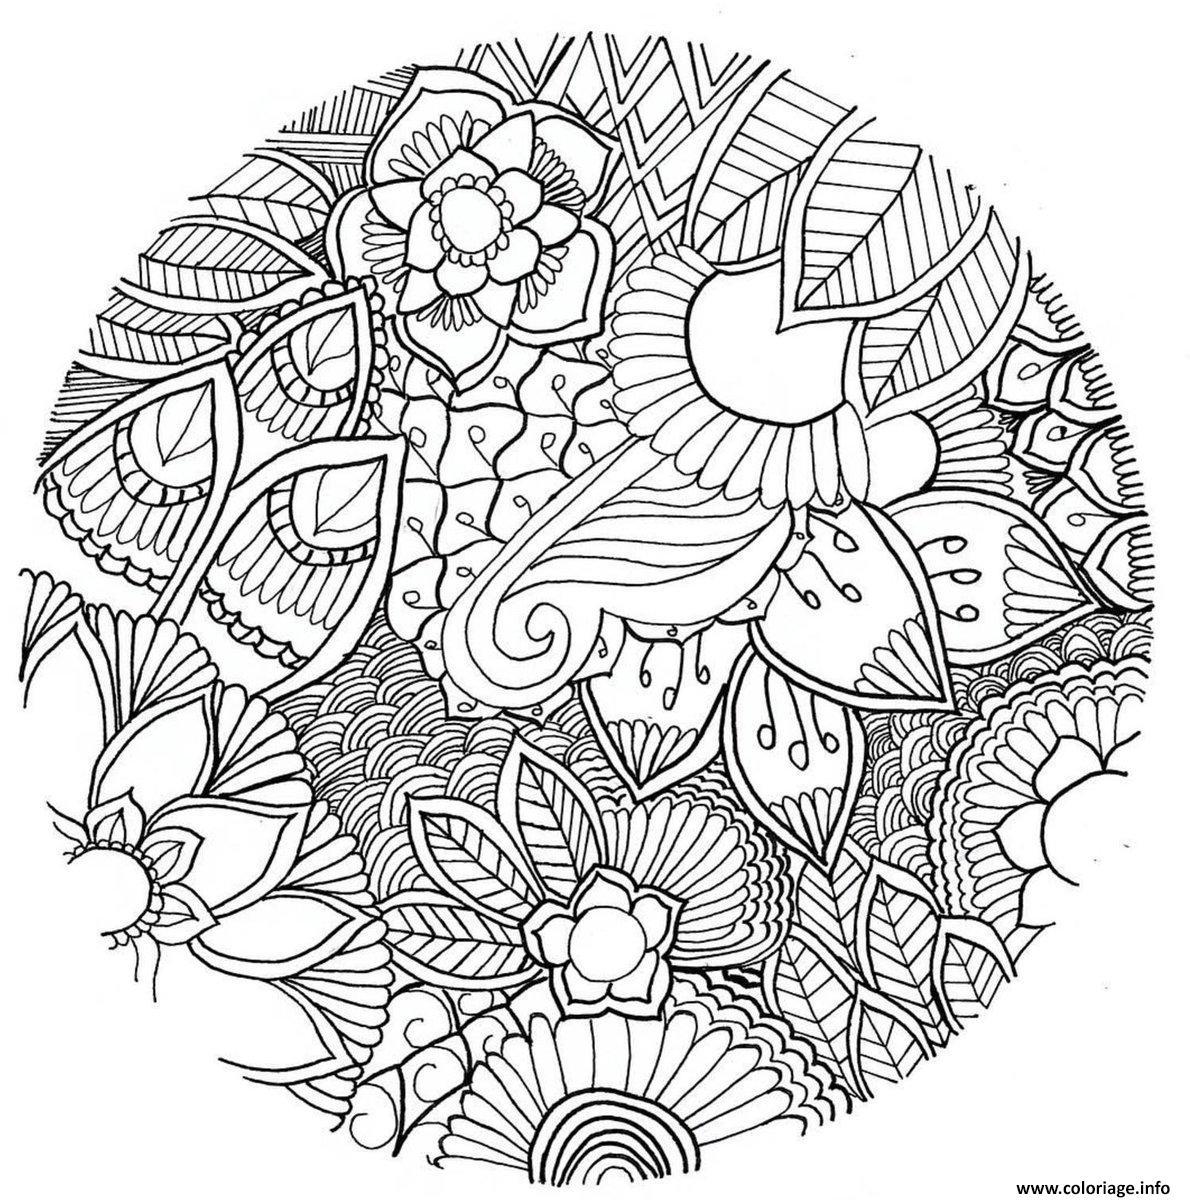 Coloriage Mandala Fleurs Vegetales Foret Adulte Dessin Mandala A Imprimer